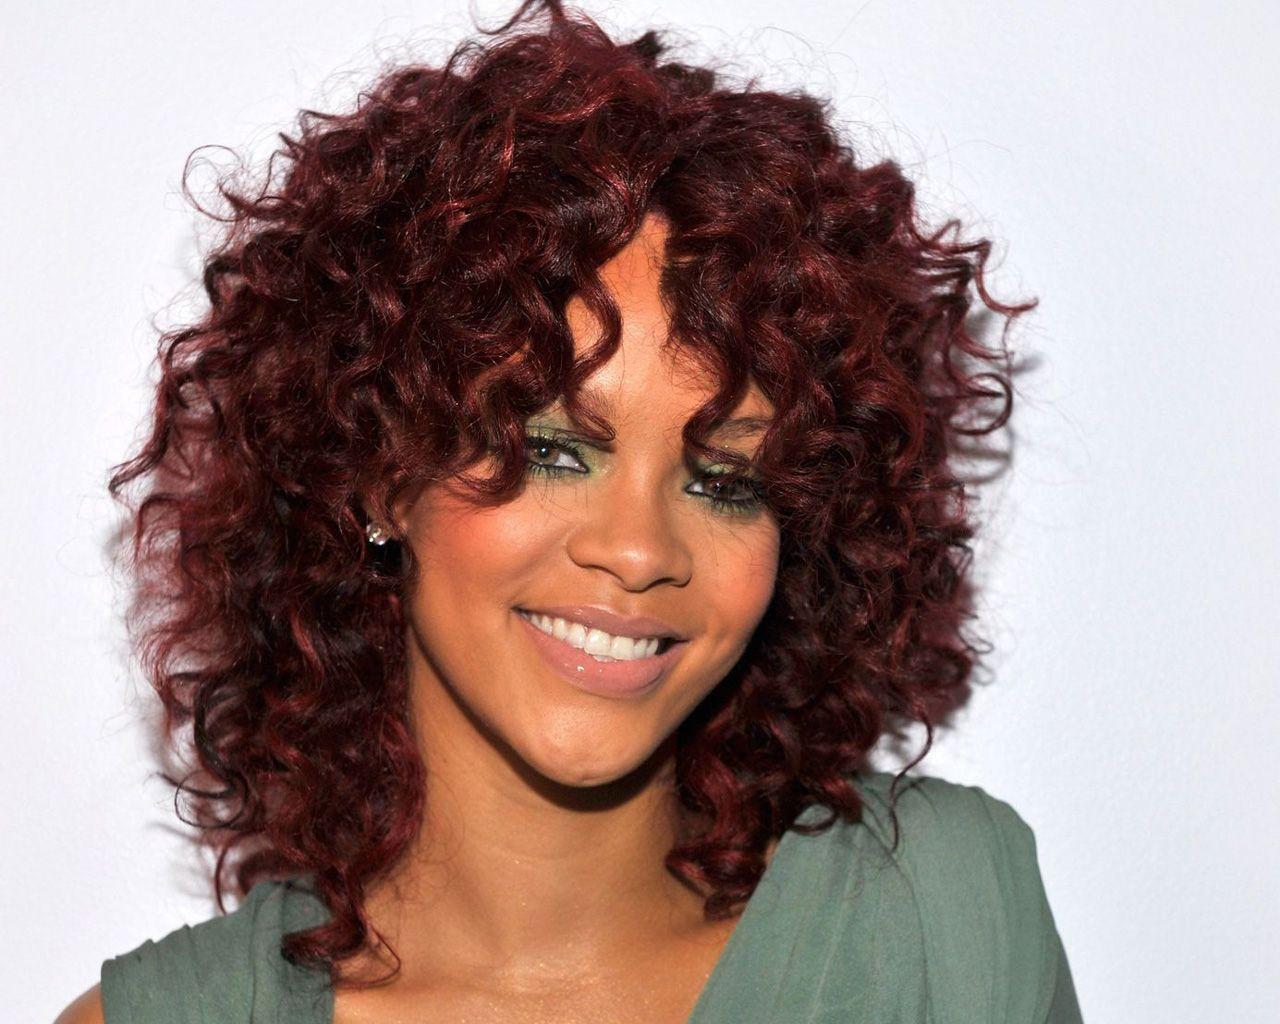 Rihanna Smile HD Desktop Wallpaper, Instagram photo